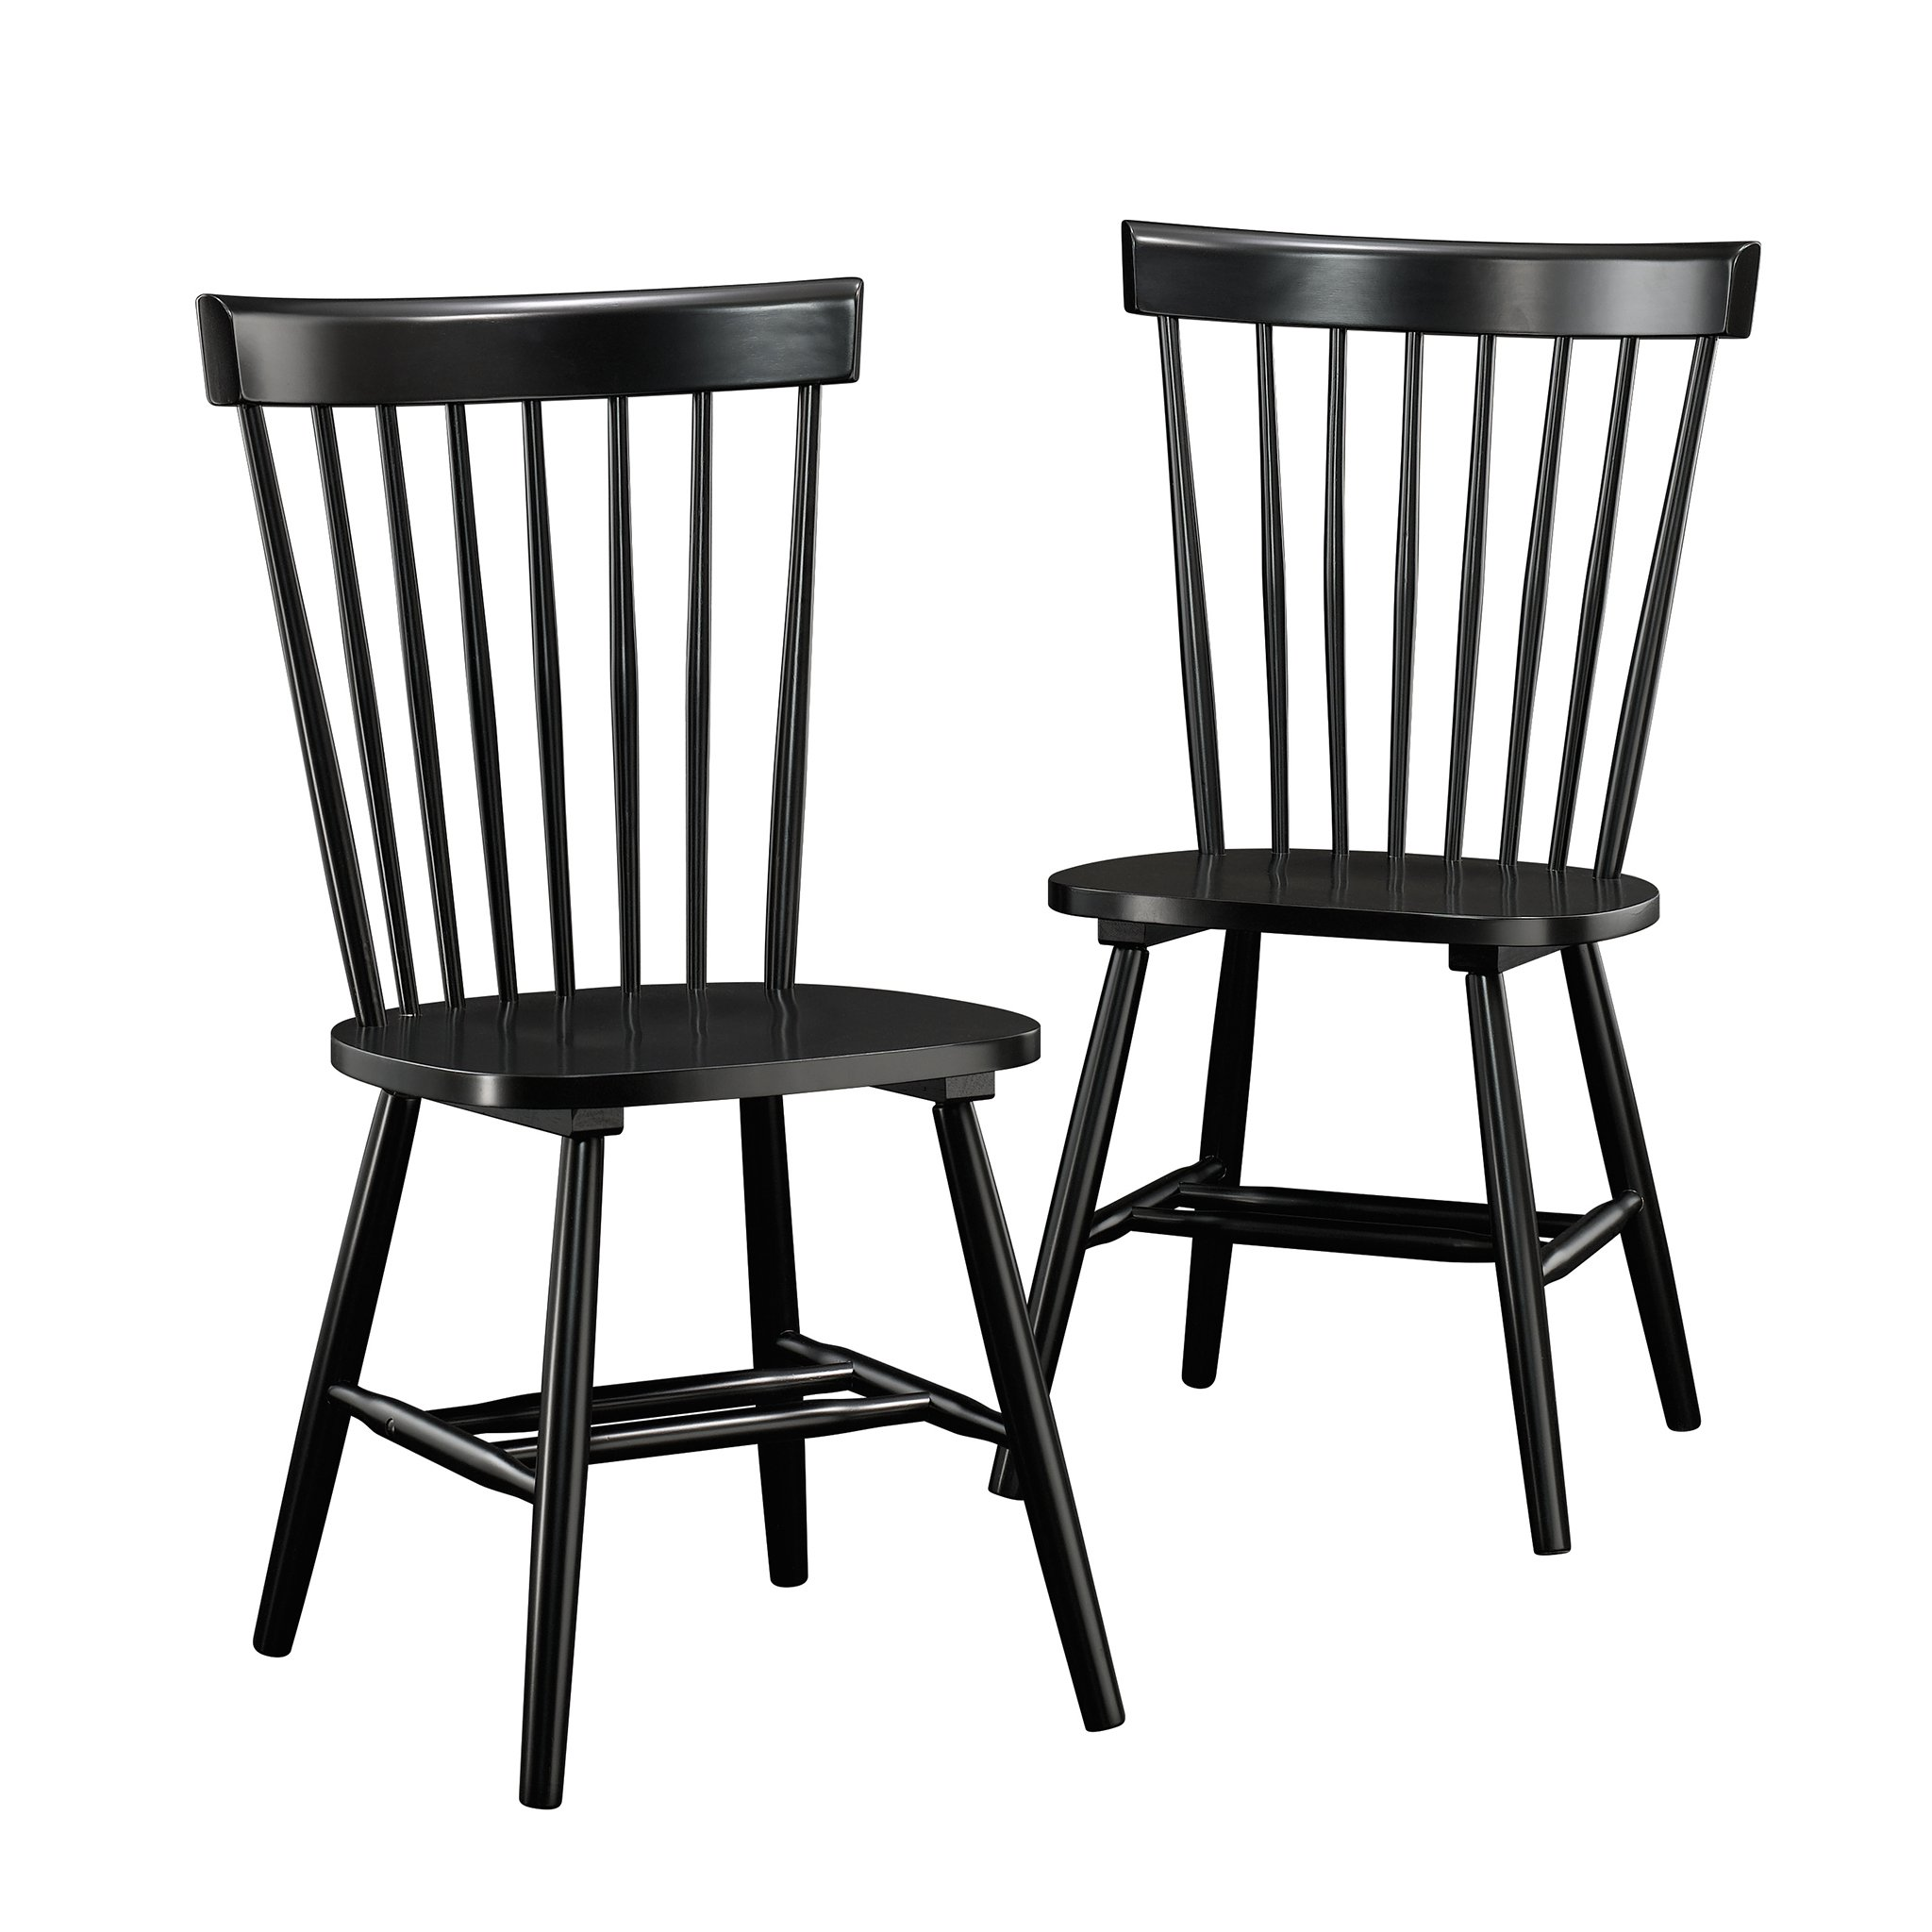 Sauder 418892 New Grange Spindle Back Chairs, L: 20.47'' x W: 21.26'' x H: 36.22'', Black finish by Sauder (Image #1)